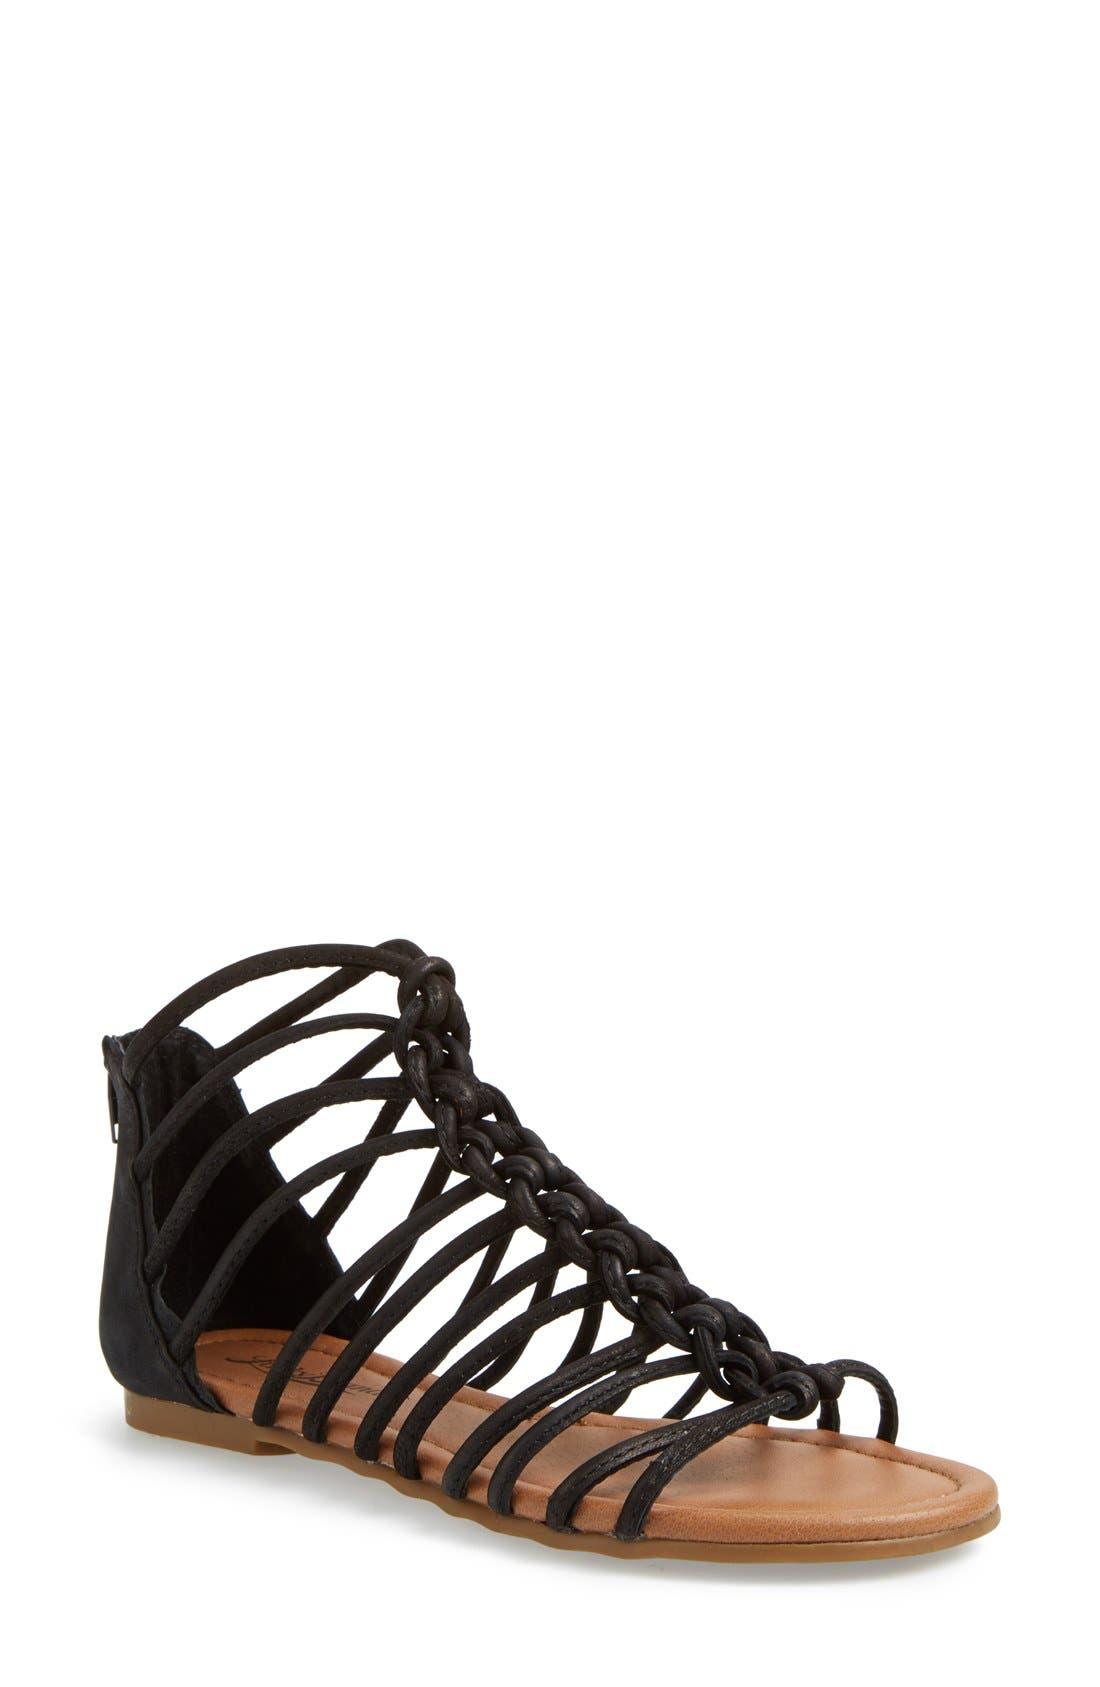 Alternate Image 1 Selected - Lucky Brand 'Casmett' Leather Caged Sandal (Women)